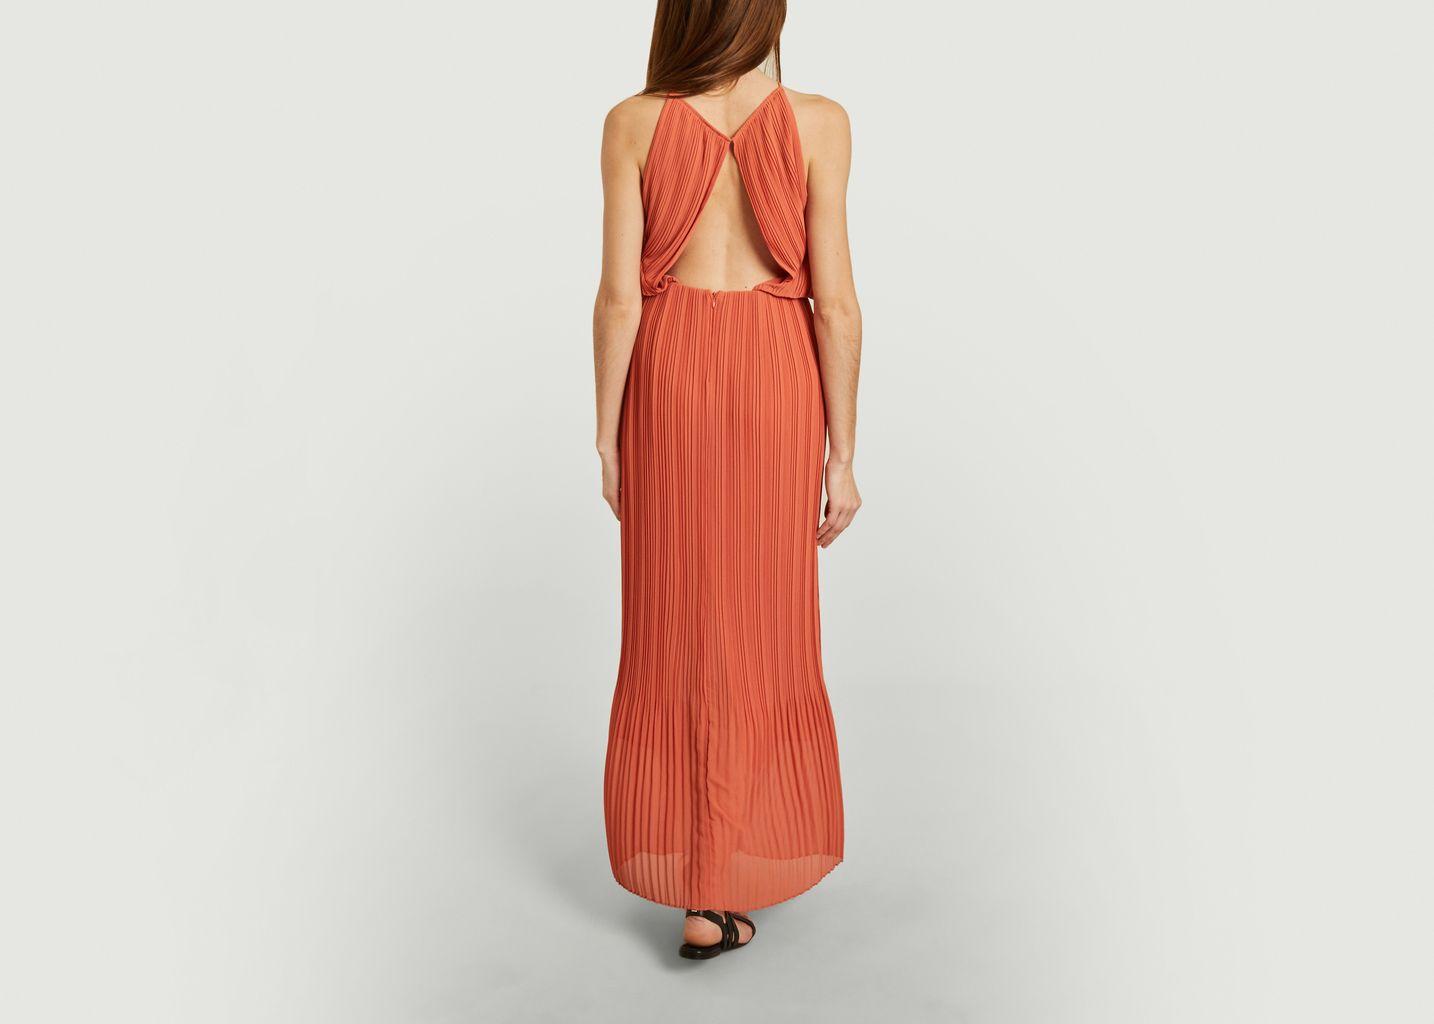 Robe longue plissée sans manche Myllow - Samsoe Samsoe